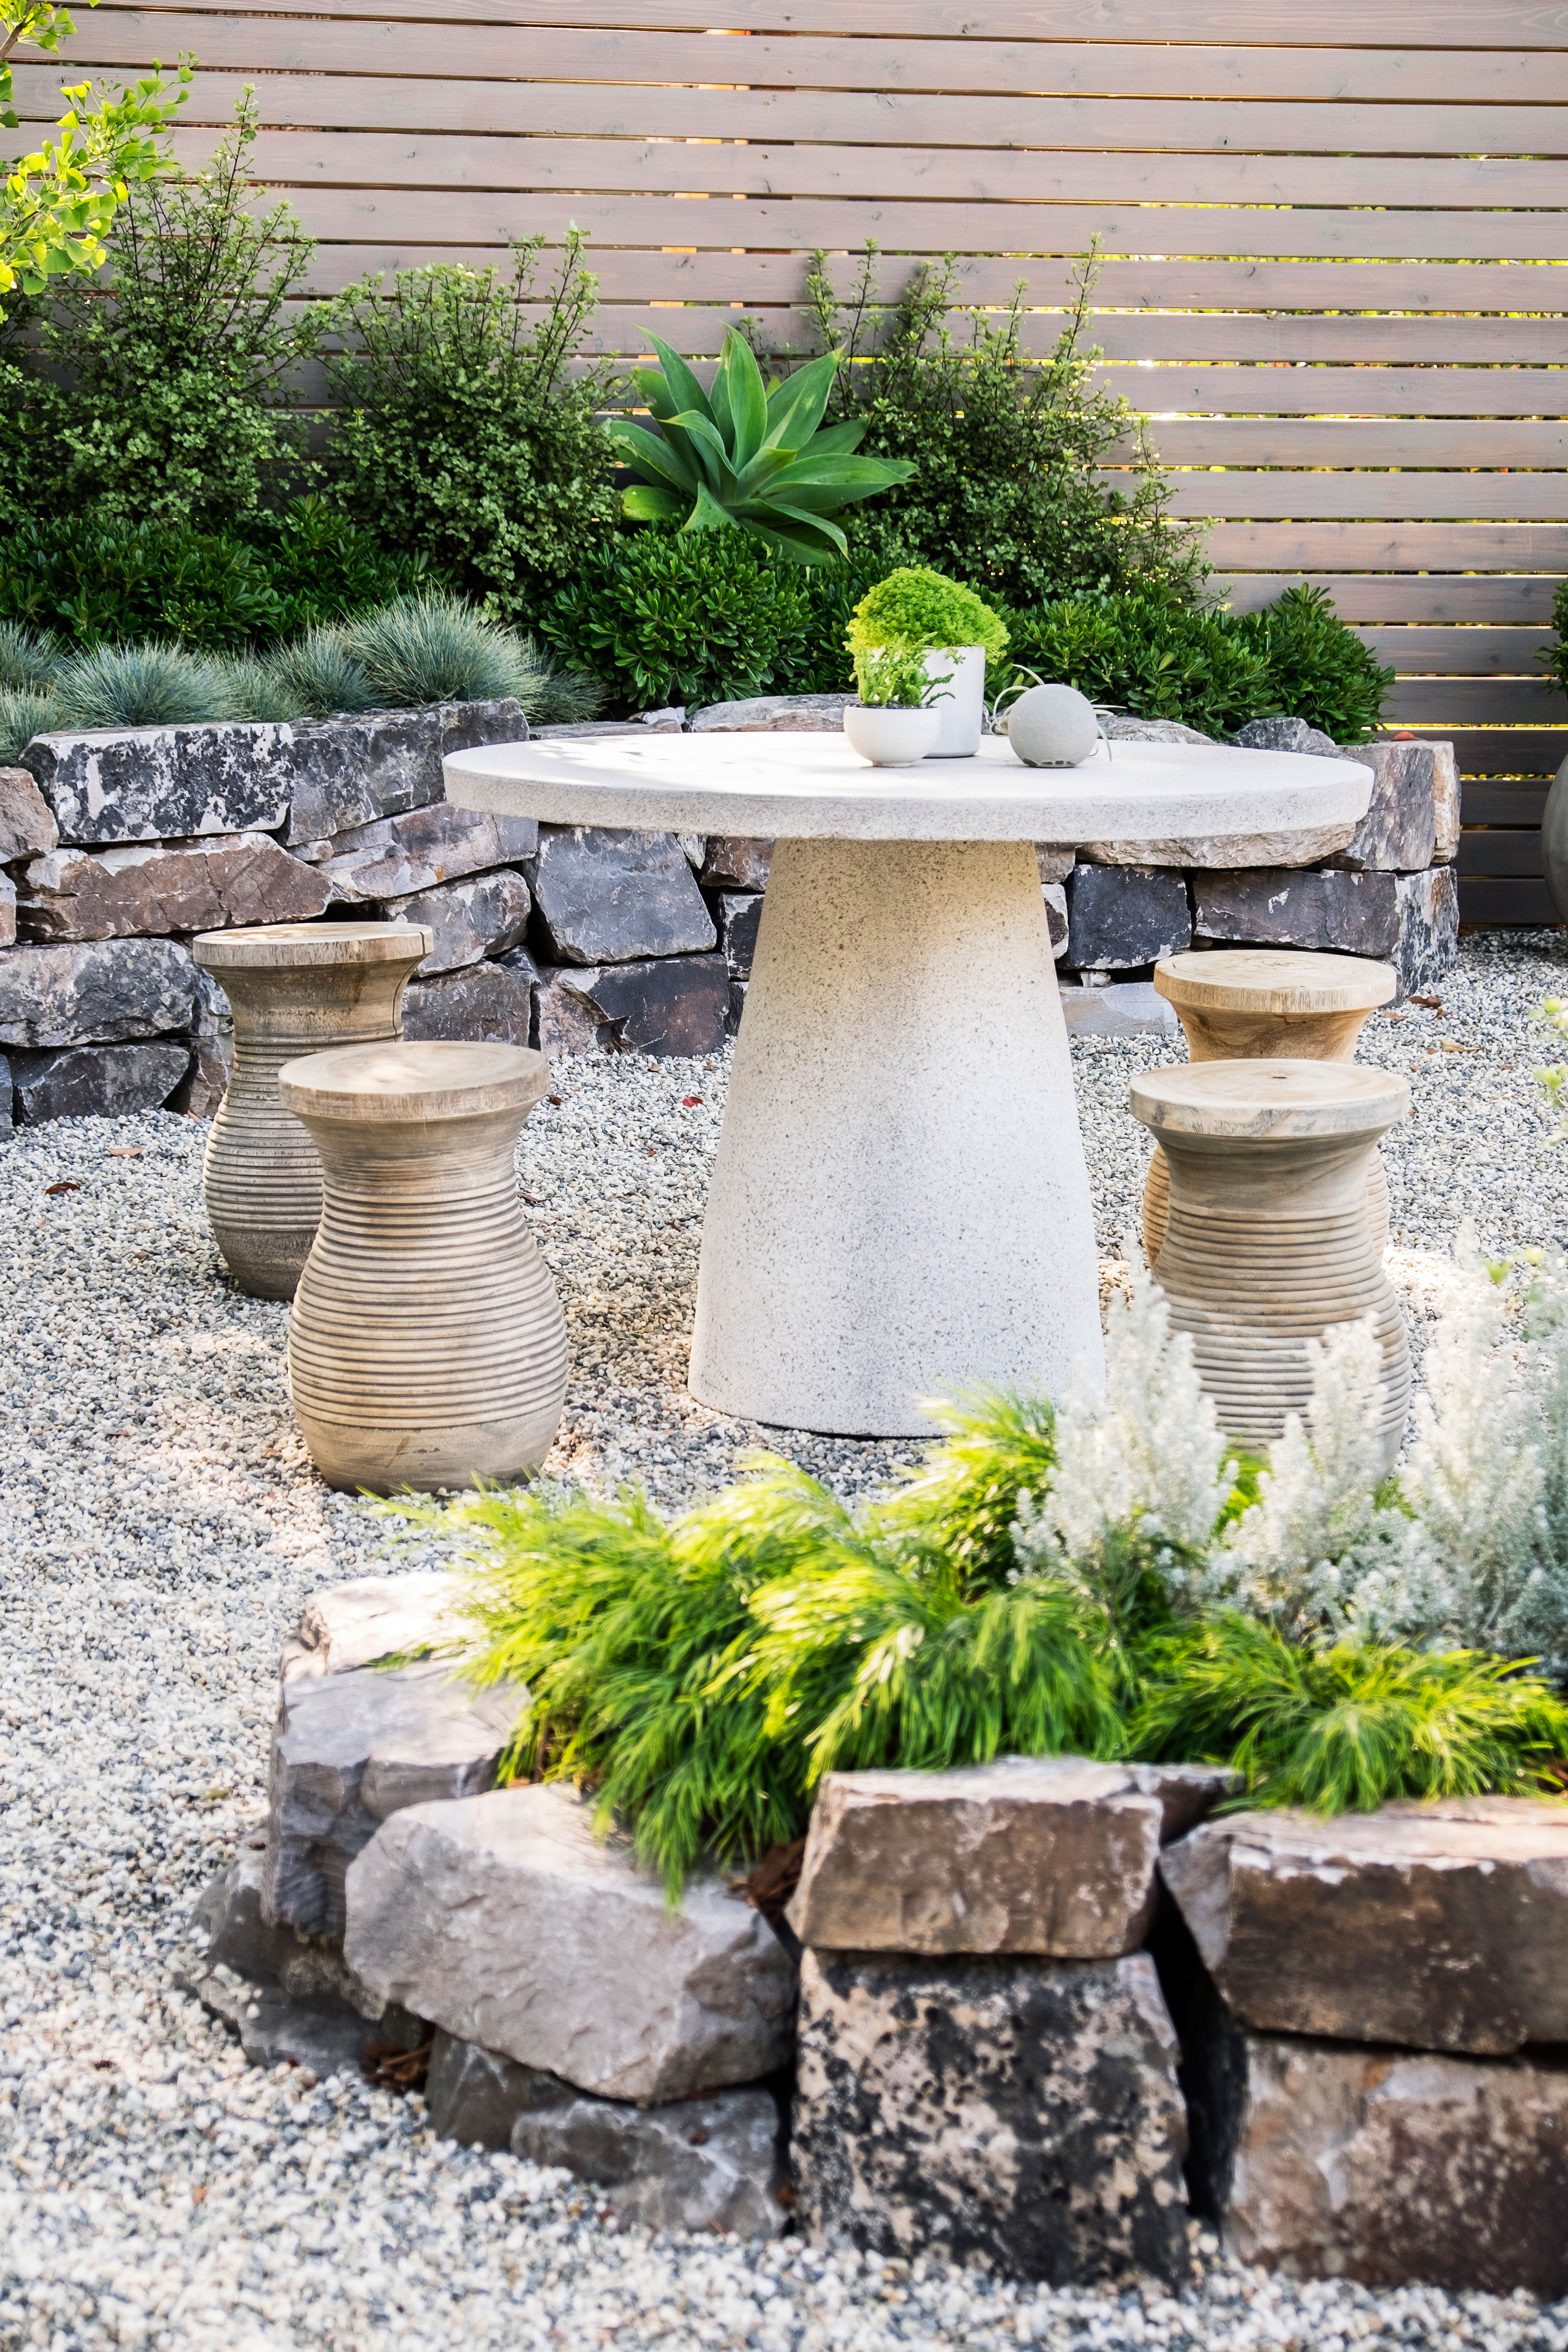 Zen Garden Design Ideas How to design a low water zen garden sunset magazine enclose outdoor dining sisterspd